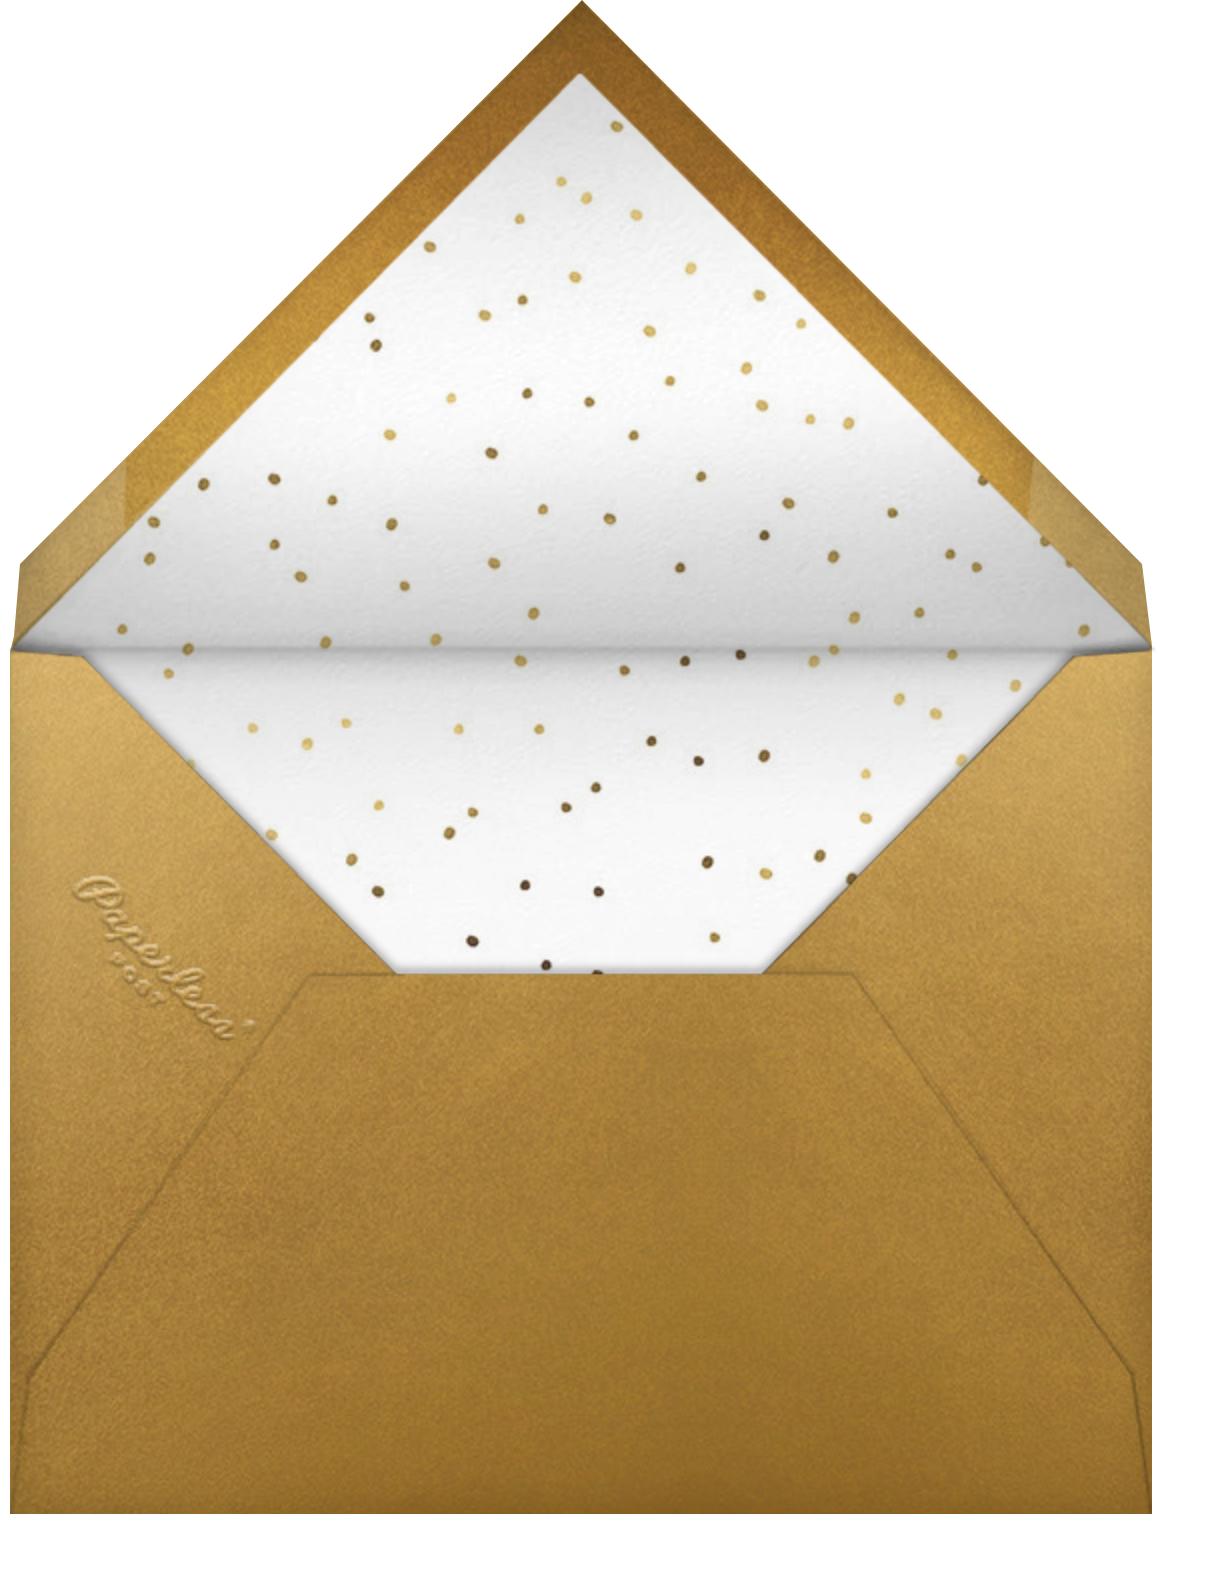 The Gold Rush Begins - Mr. Boddington's Studio - Save the date - envelope back